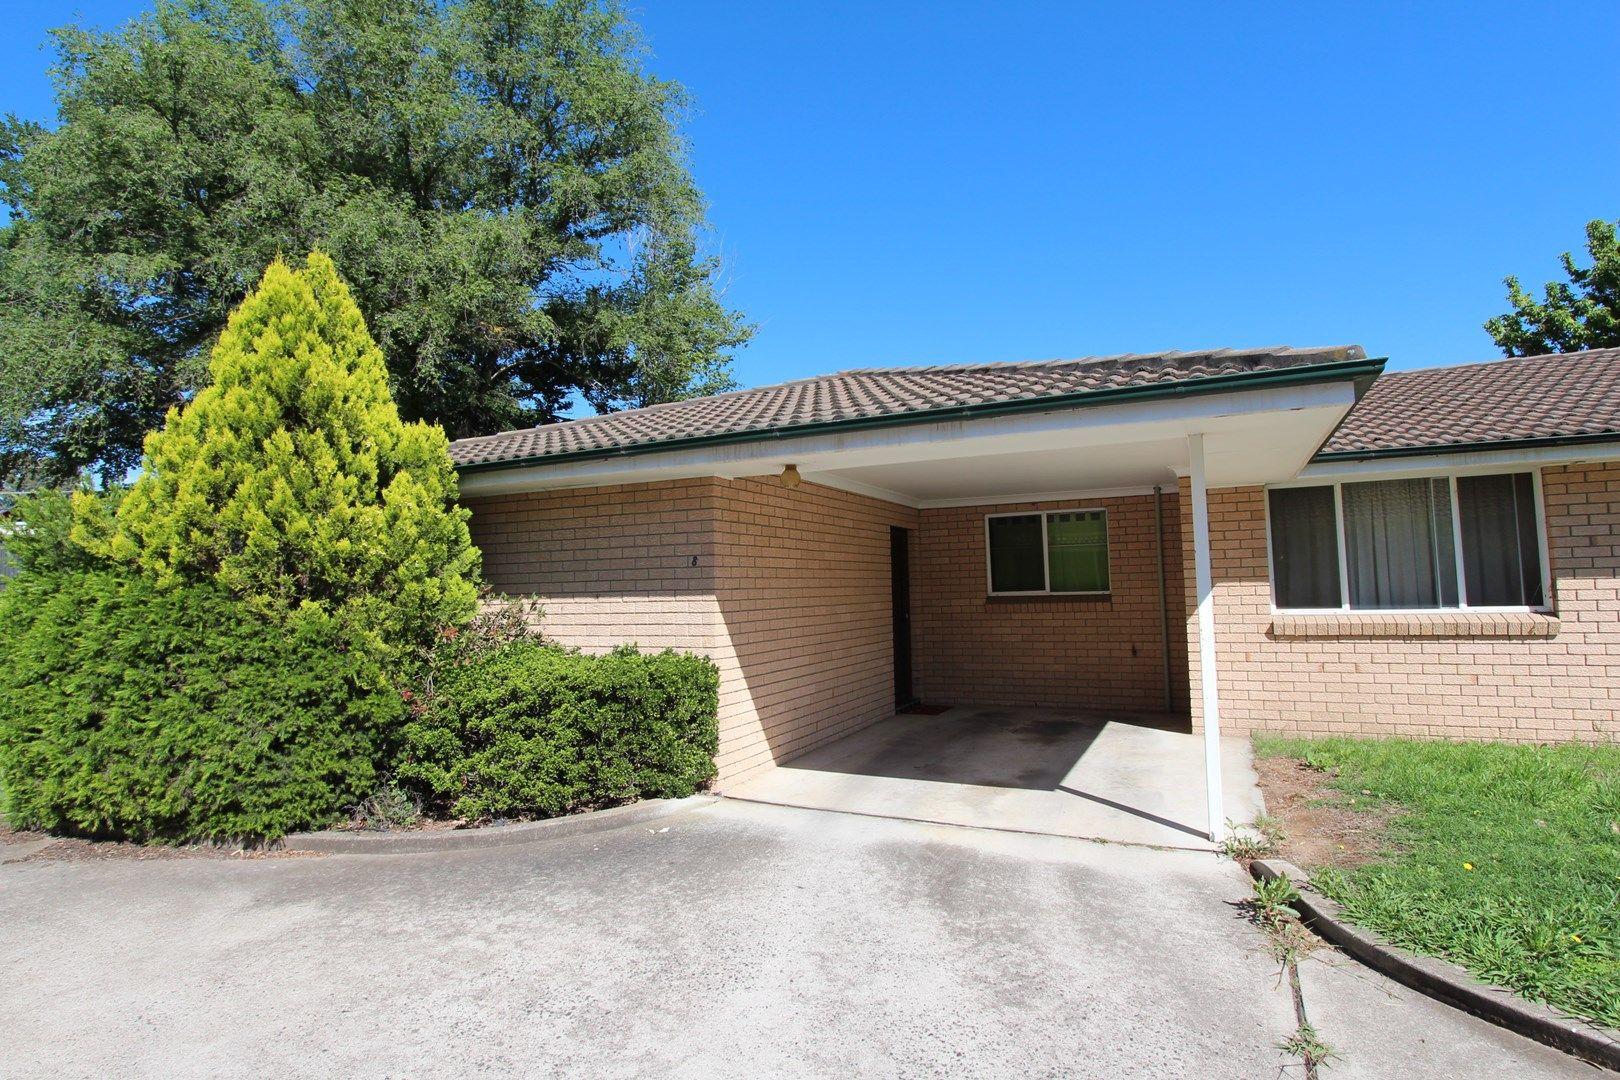 8/23 Havannah St, Bathurst NSW 2795, Image 0